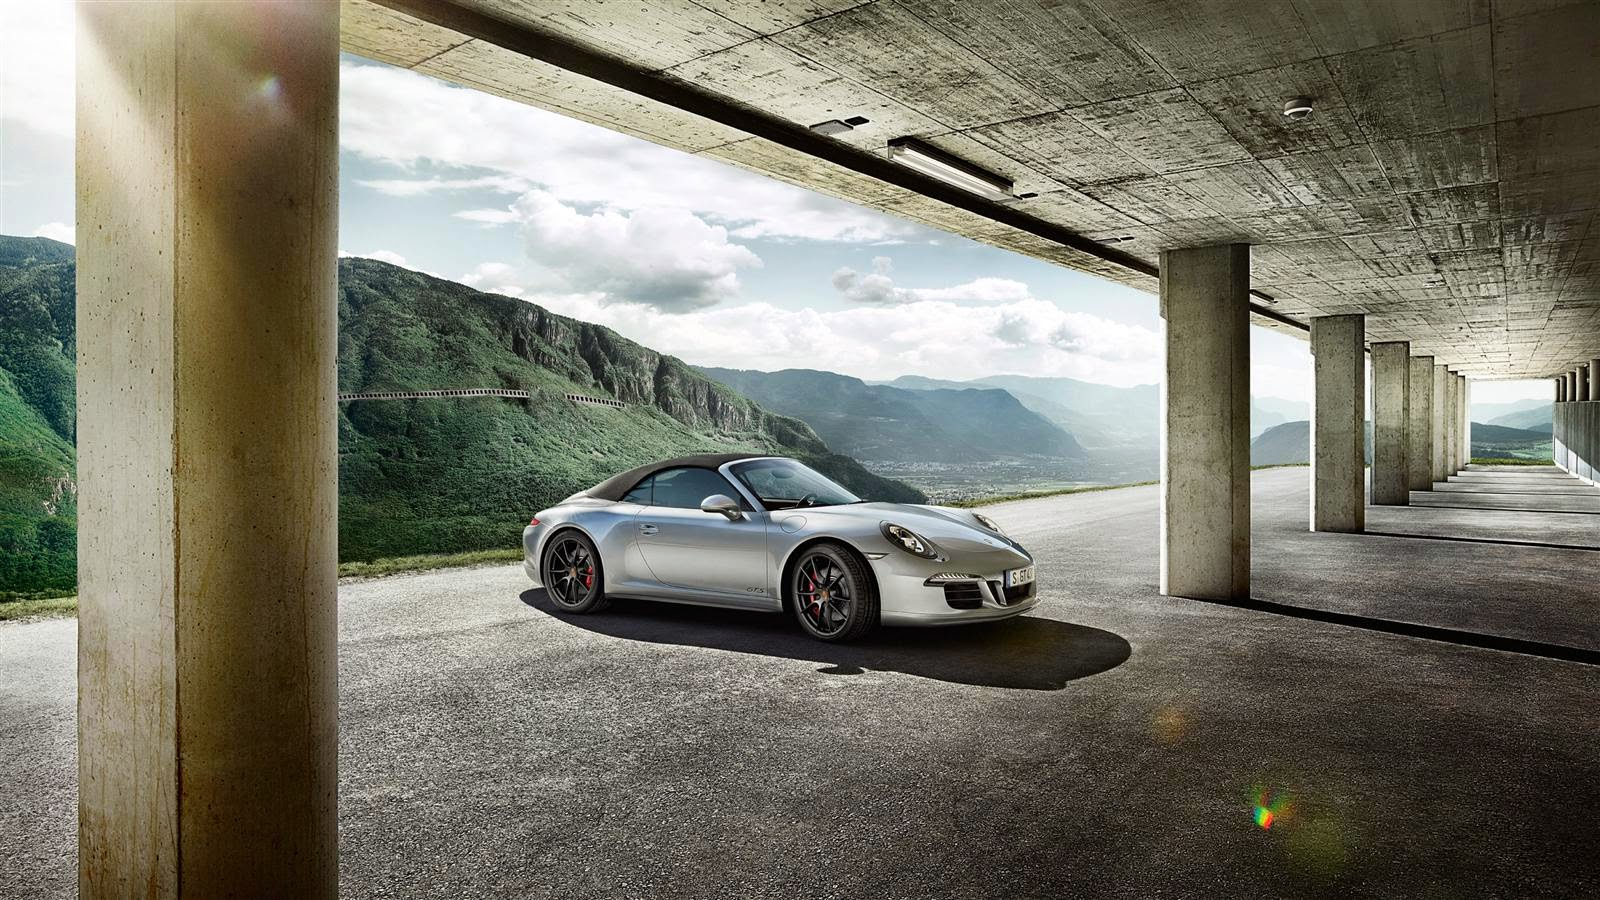 2016 Porsche 911 Carrera GTS Club Coupe Caricos